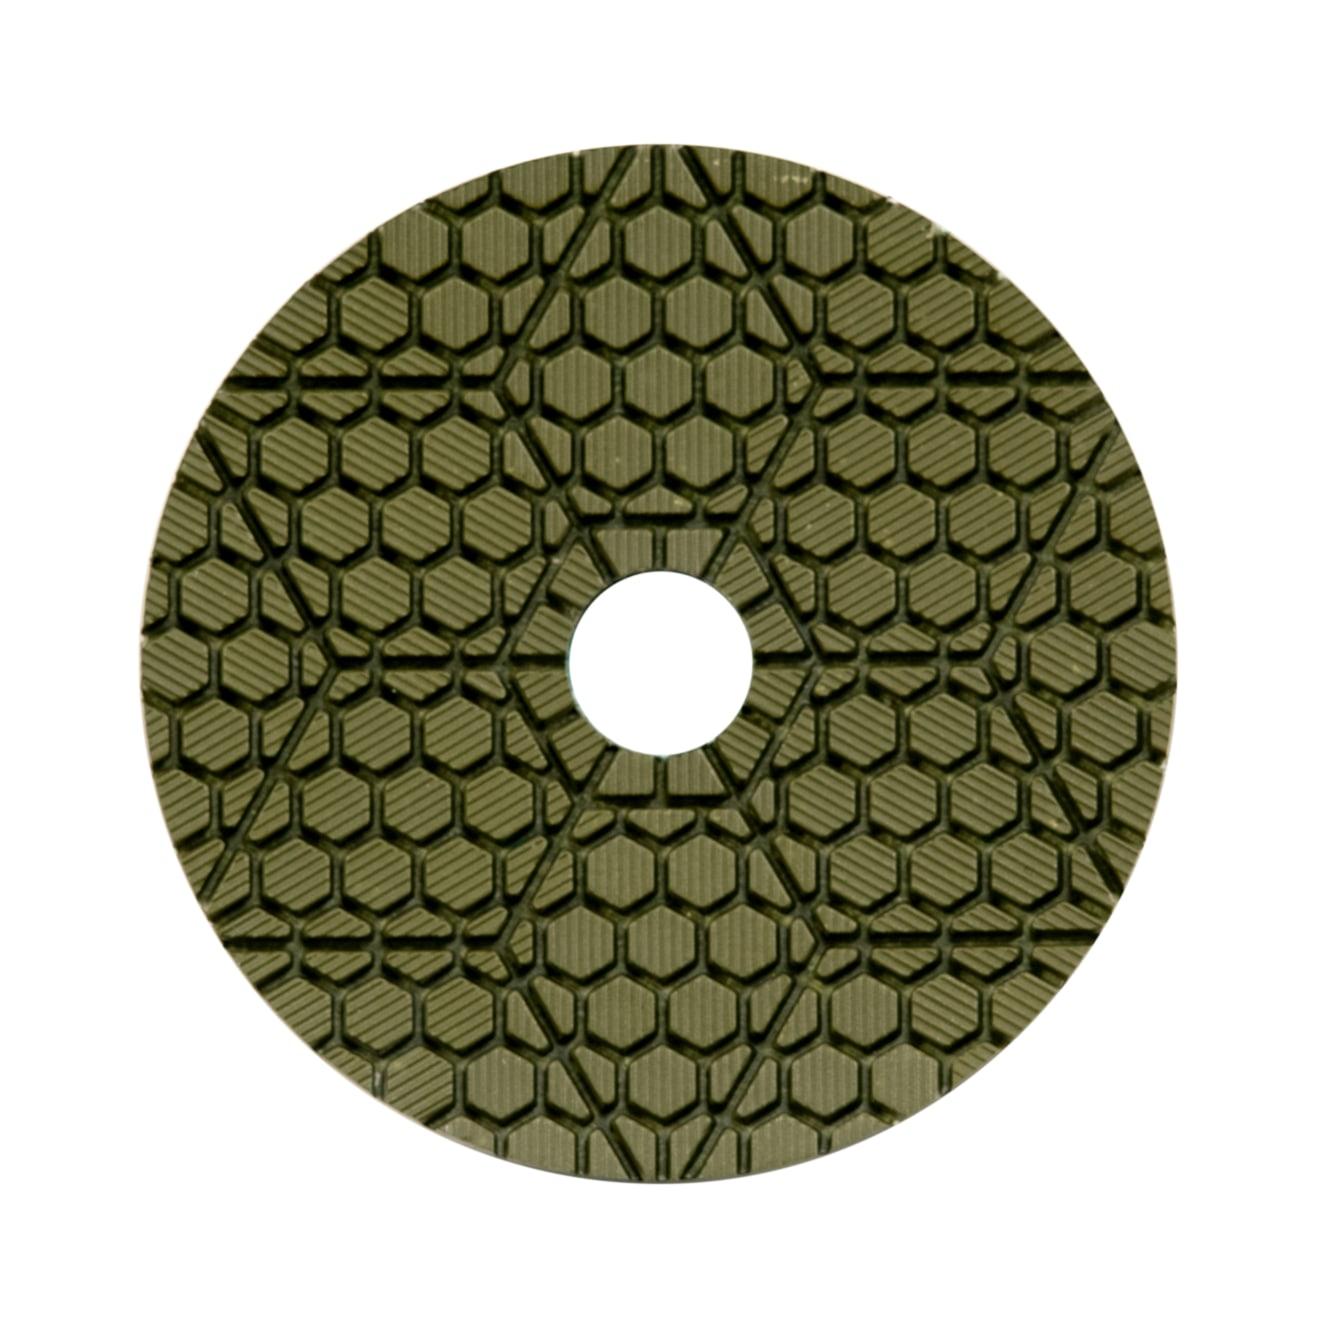 "ODYN Premium Wet Stone Polishing Pad 4"" x 5/8"" - 800 Grit"